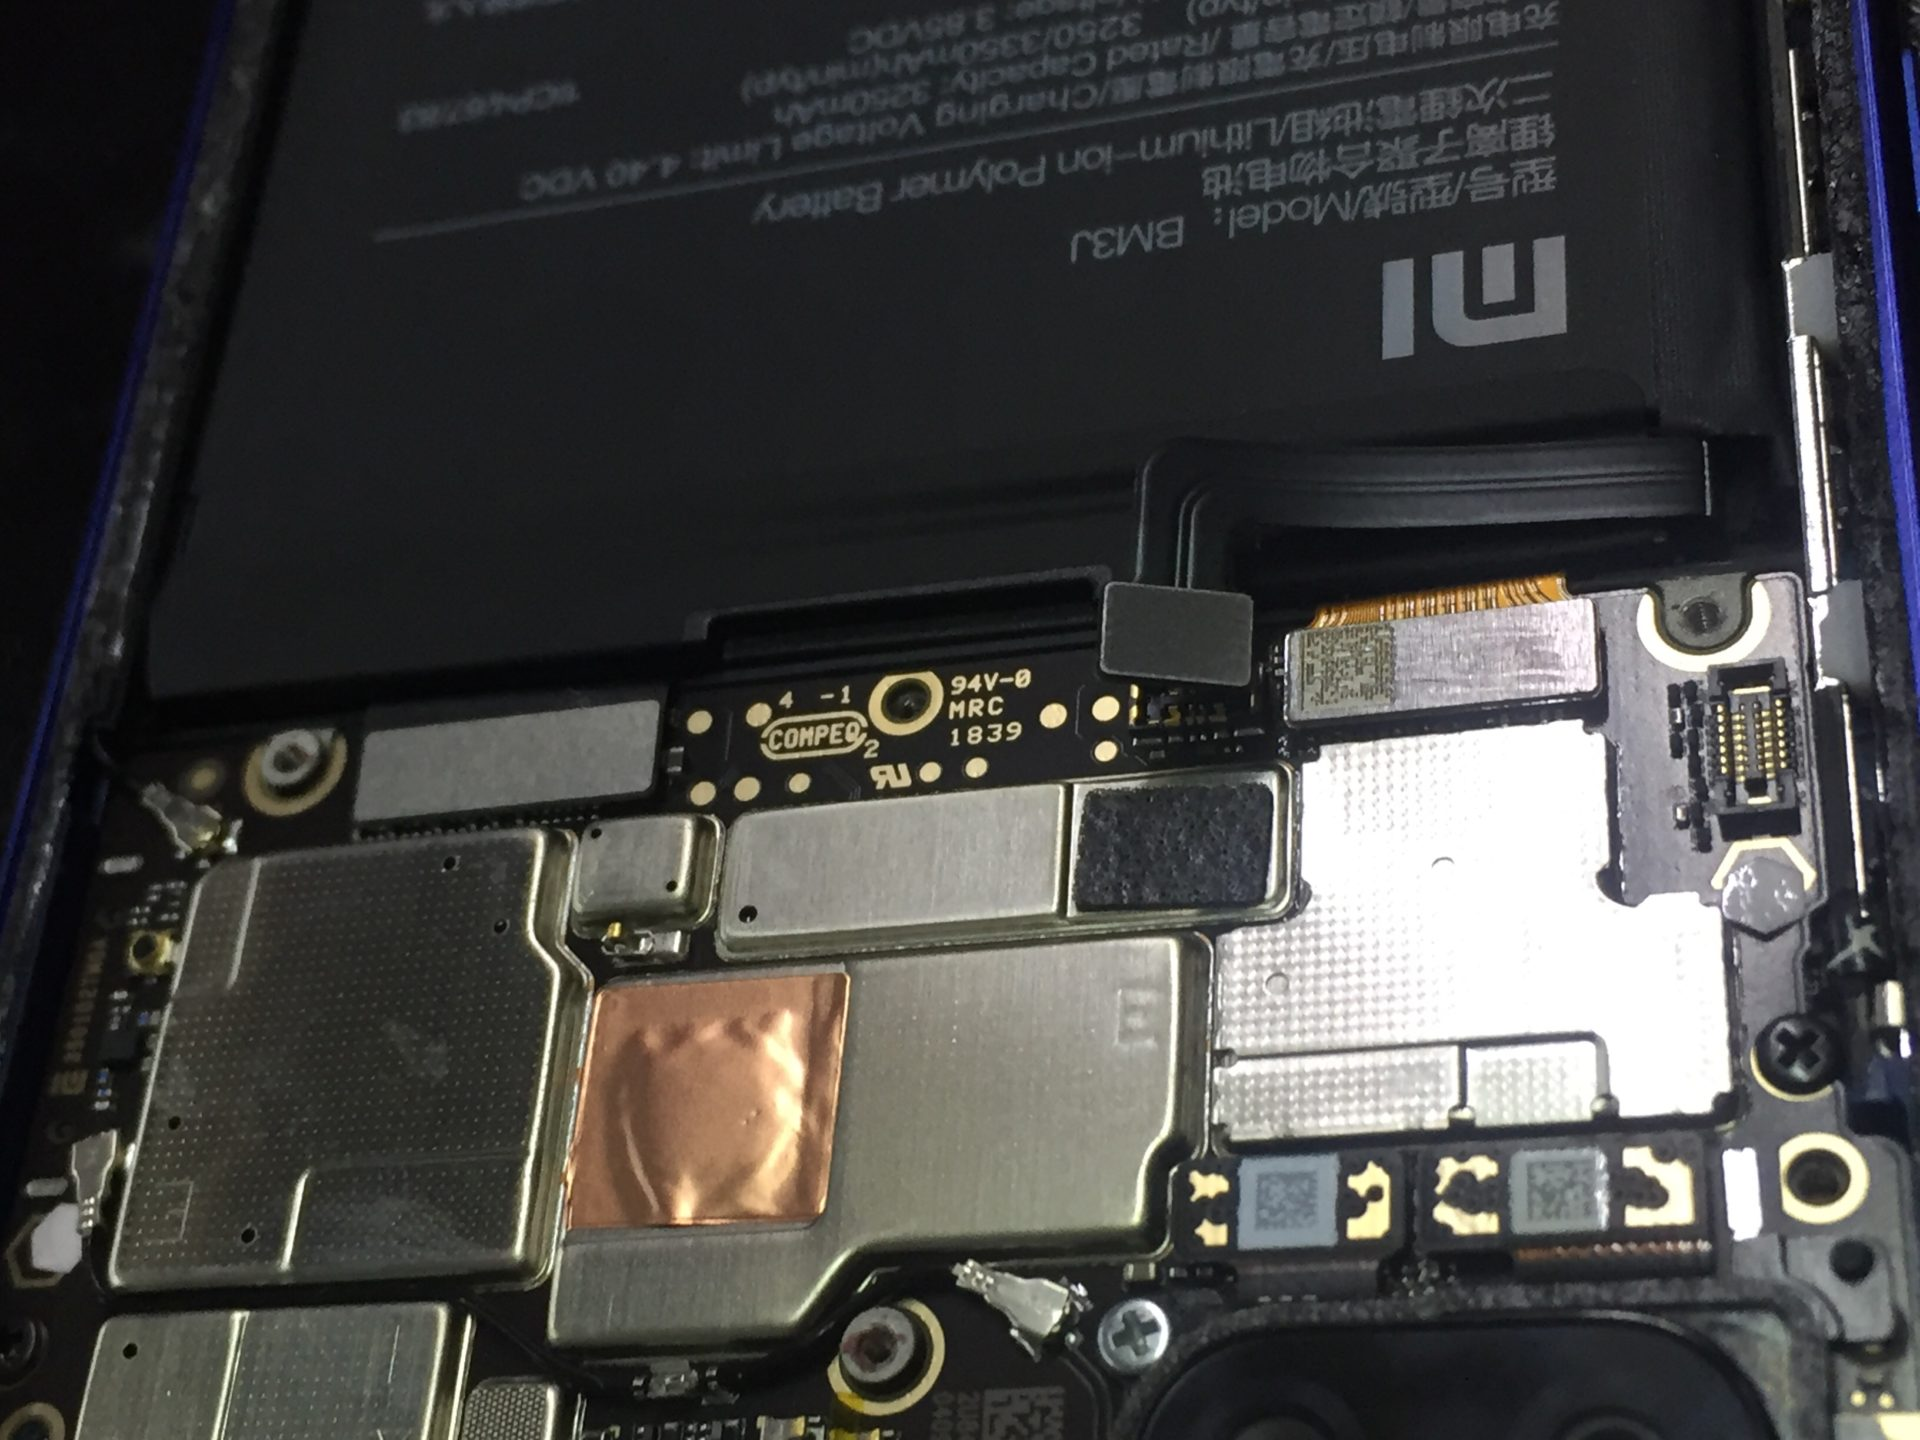 На Xiaomi Mi 8 Lite разбилось стекло - ремонт (разборка и замена дисплея)